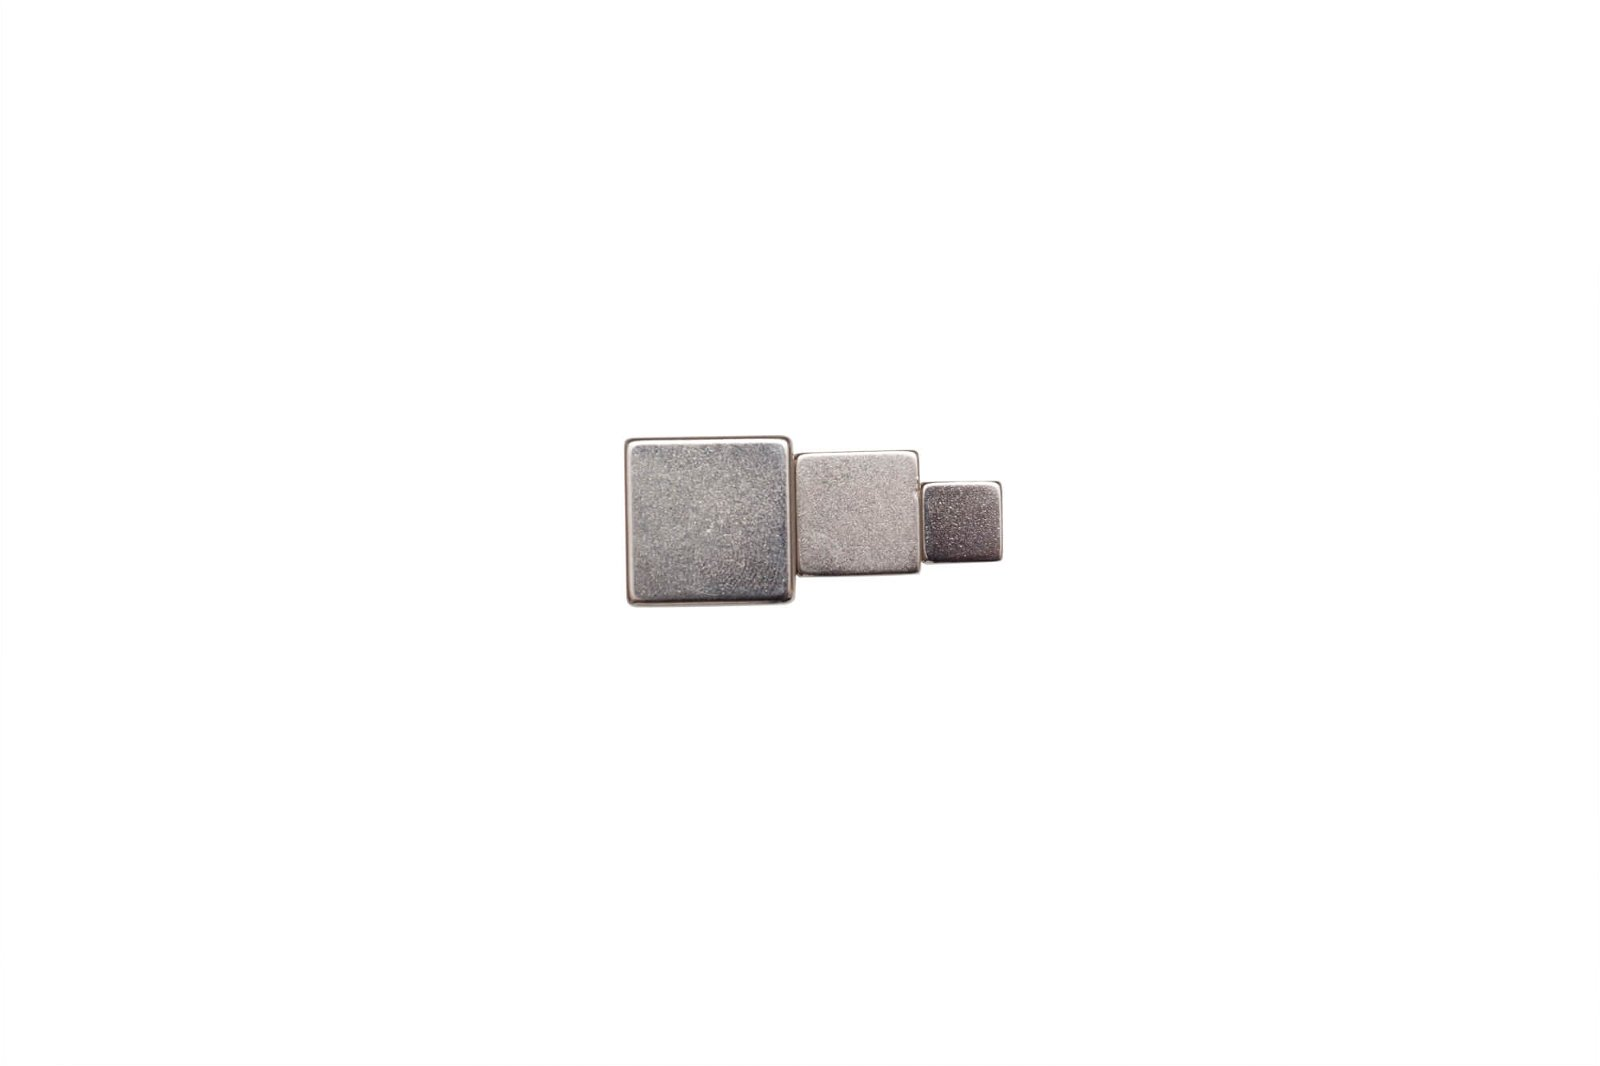 Neodym-Würfelmagnet, 20x20x20 mm, 20 kg Haftkraft, hellsilber